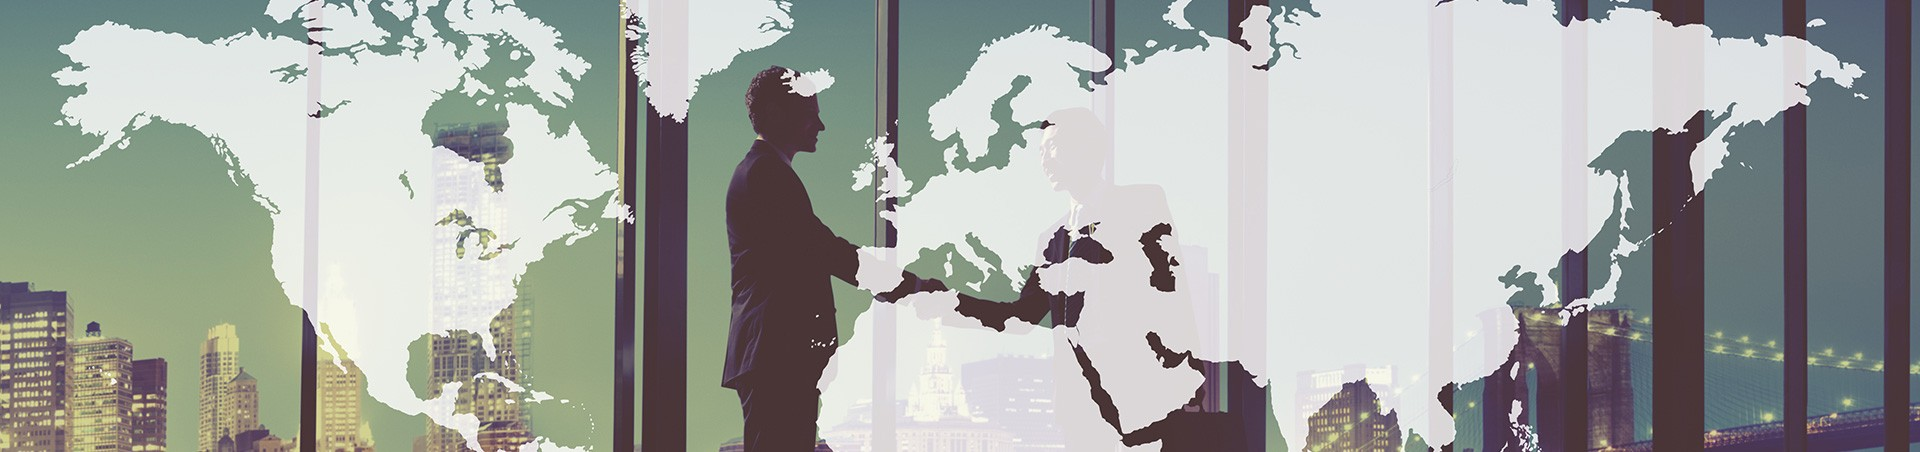 Internationale juridische diensten Delissen Martens